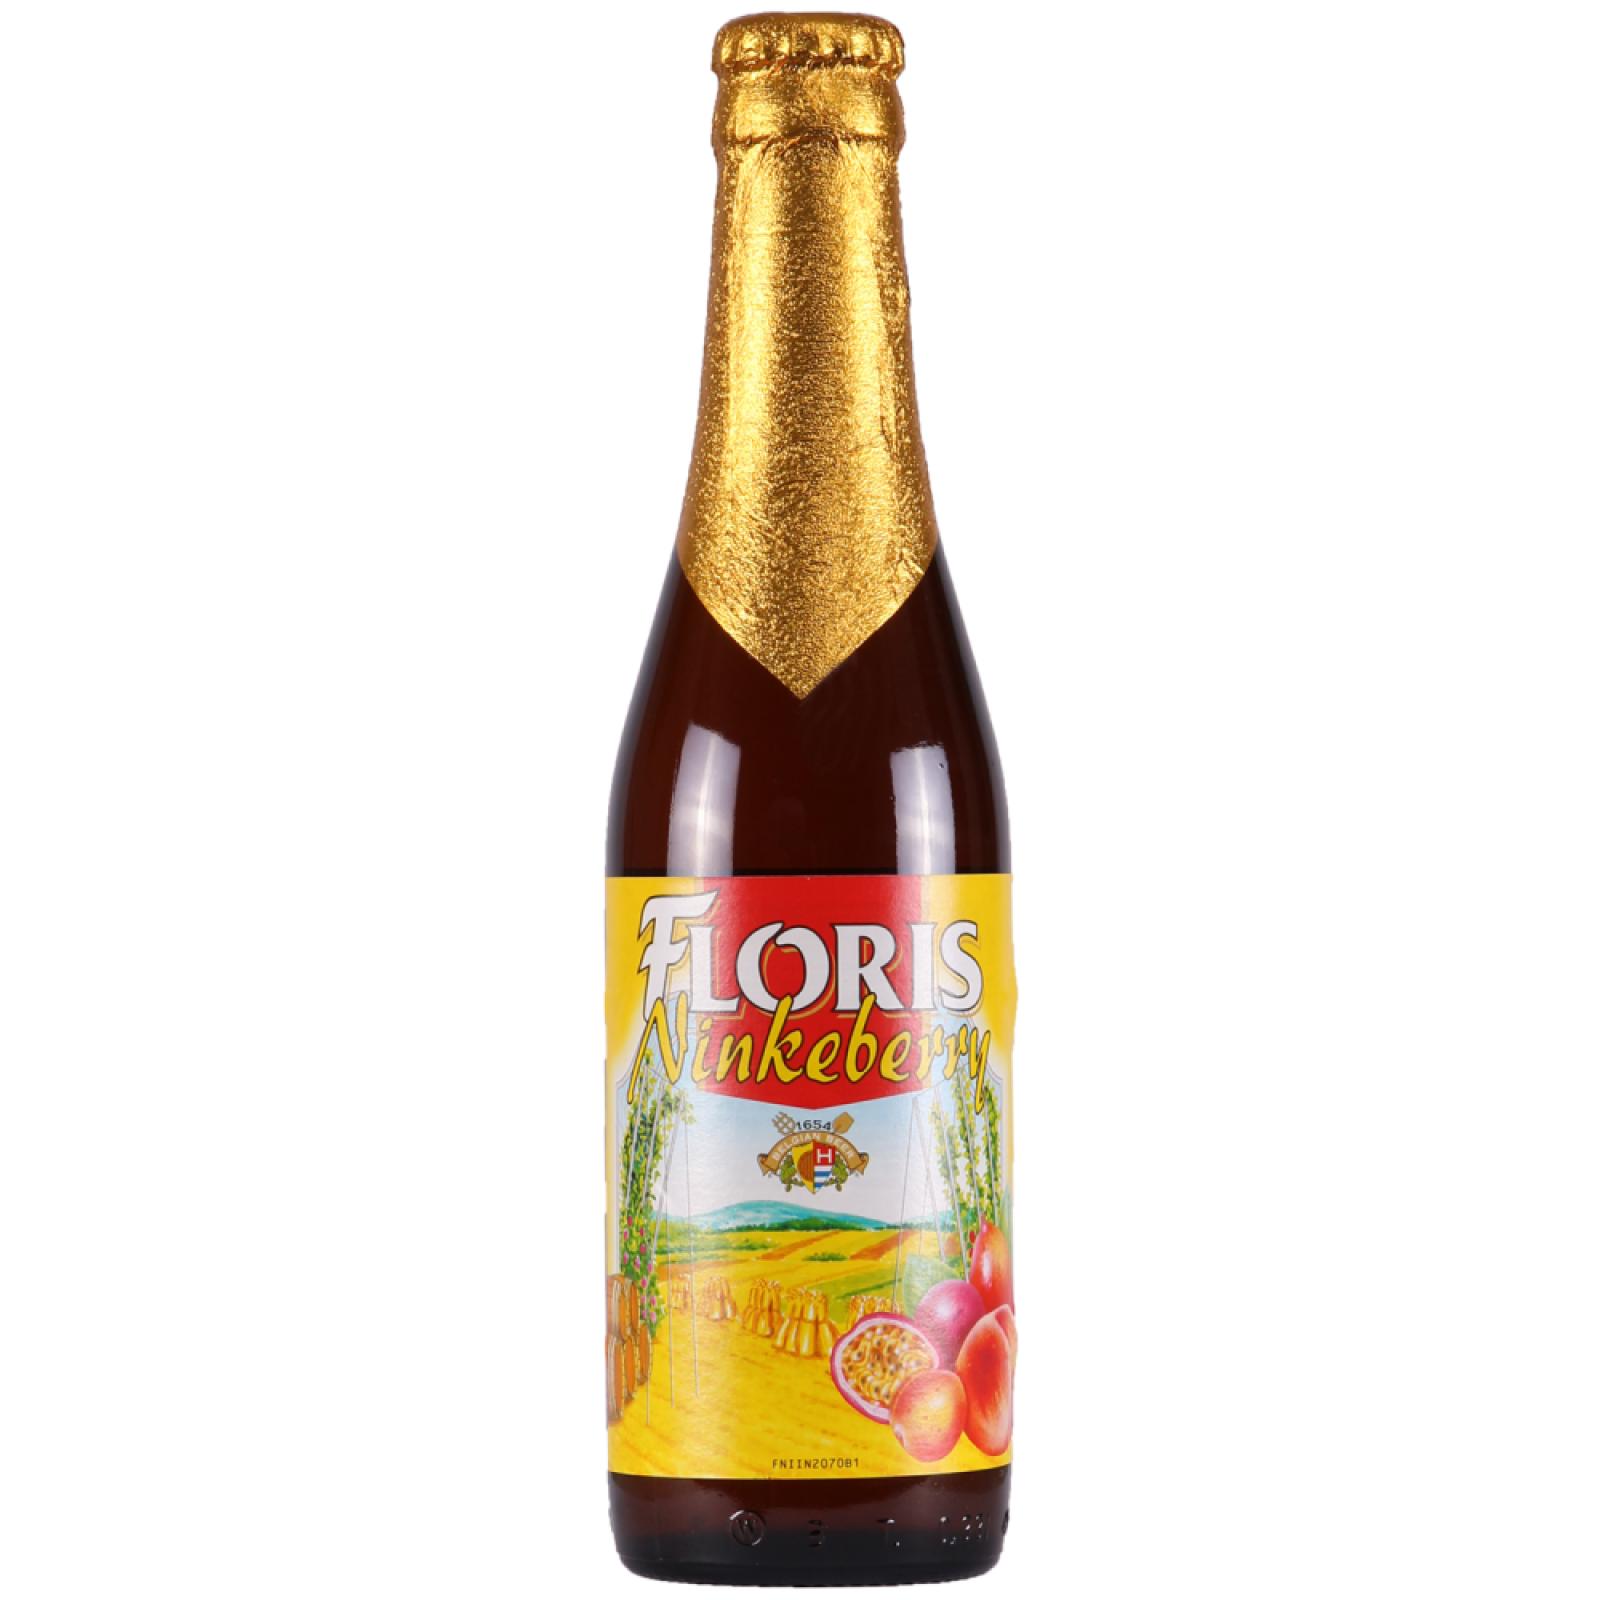 Floris Ninkeberry 3.6% 330ml